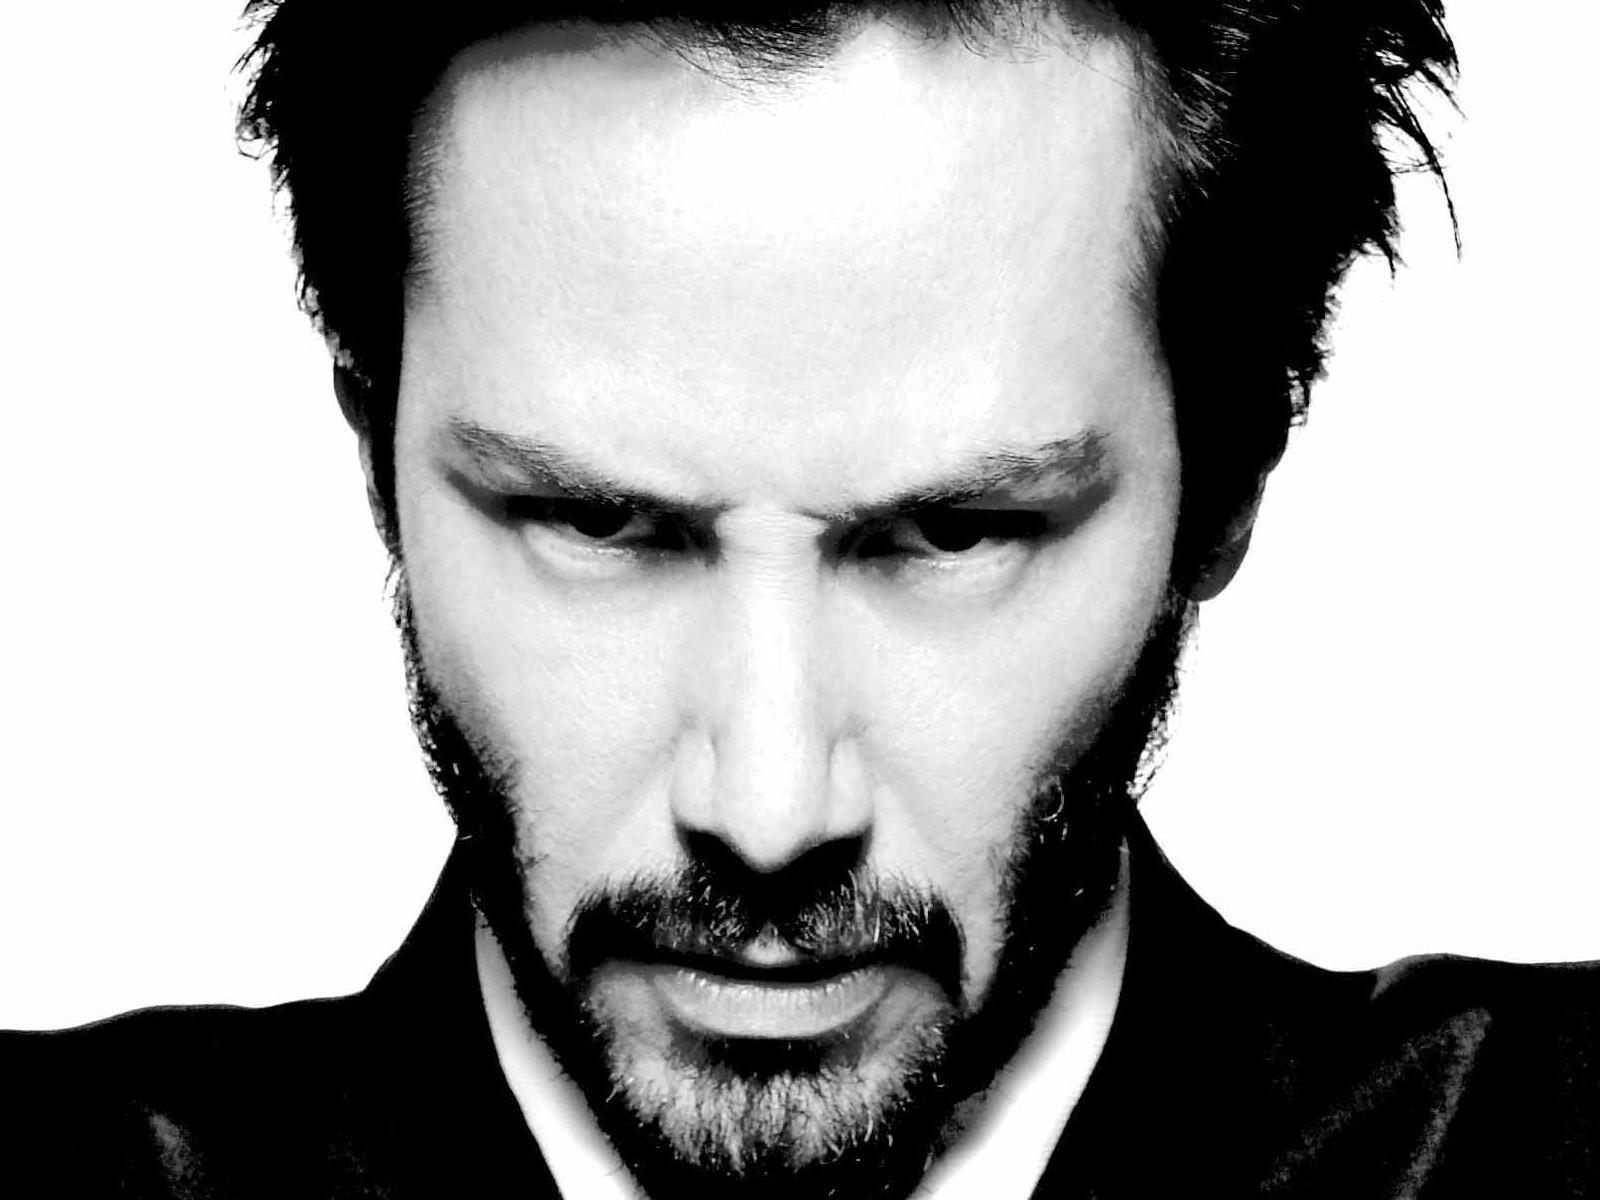 Keanu Reeves Wallpaper @ go4celebrity.com